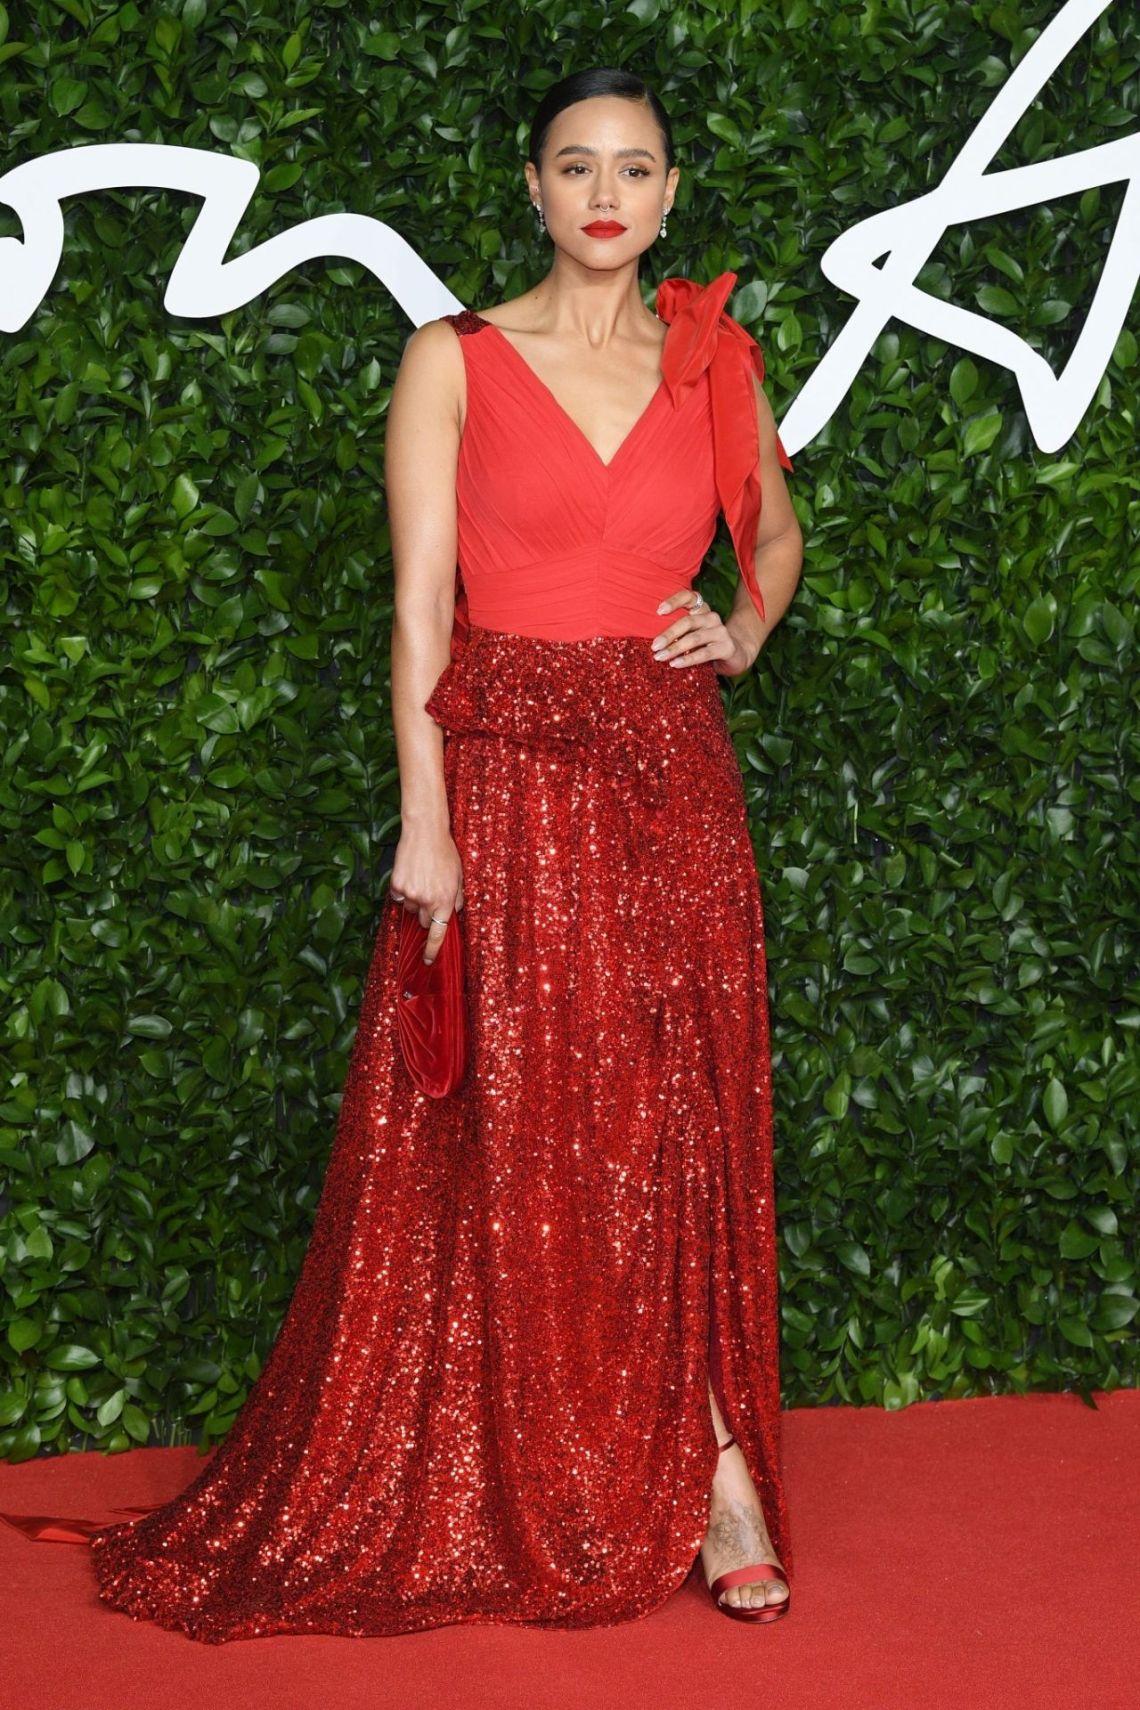 nathalie-emmanuel-fashion-awards-2019-red-carpet-in-london-5